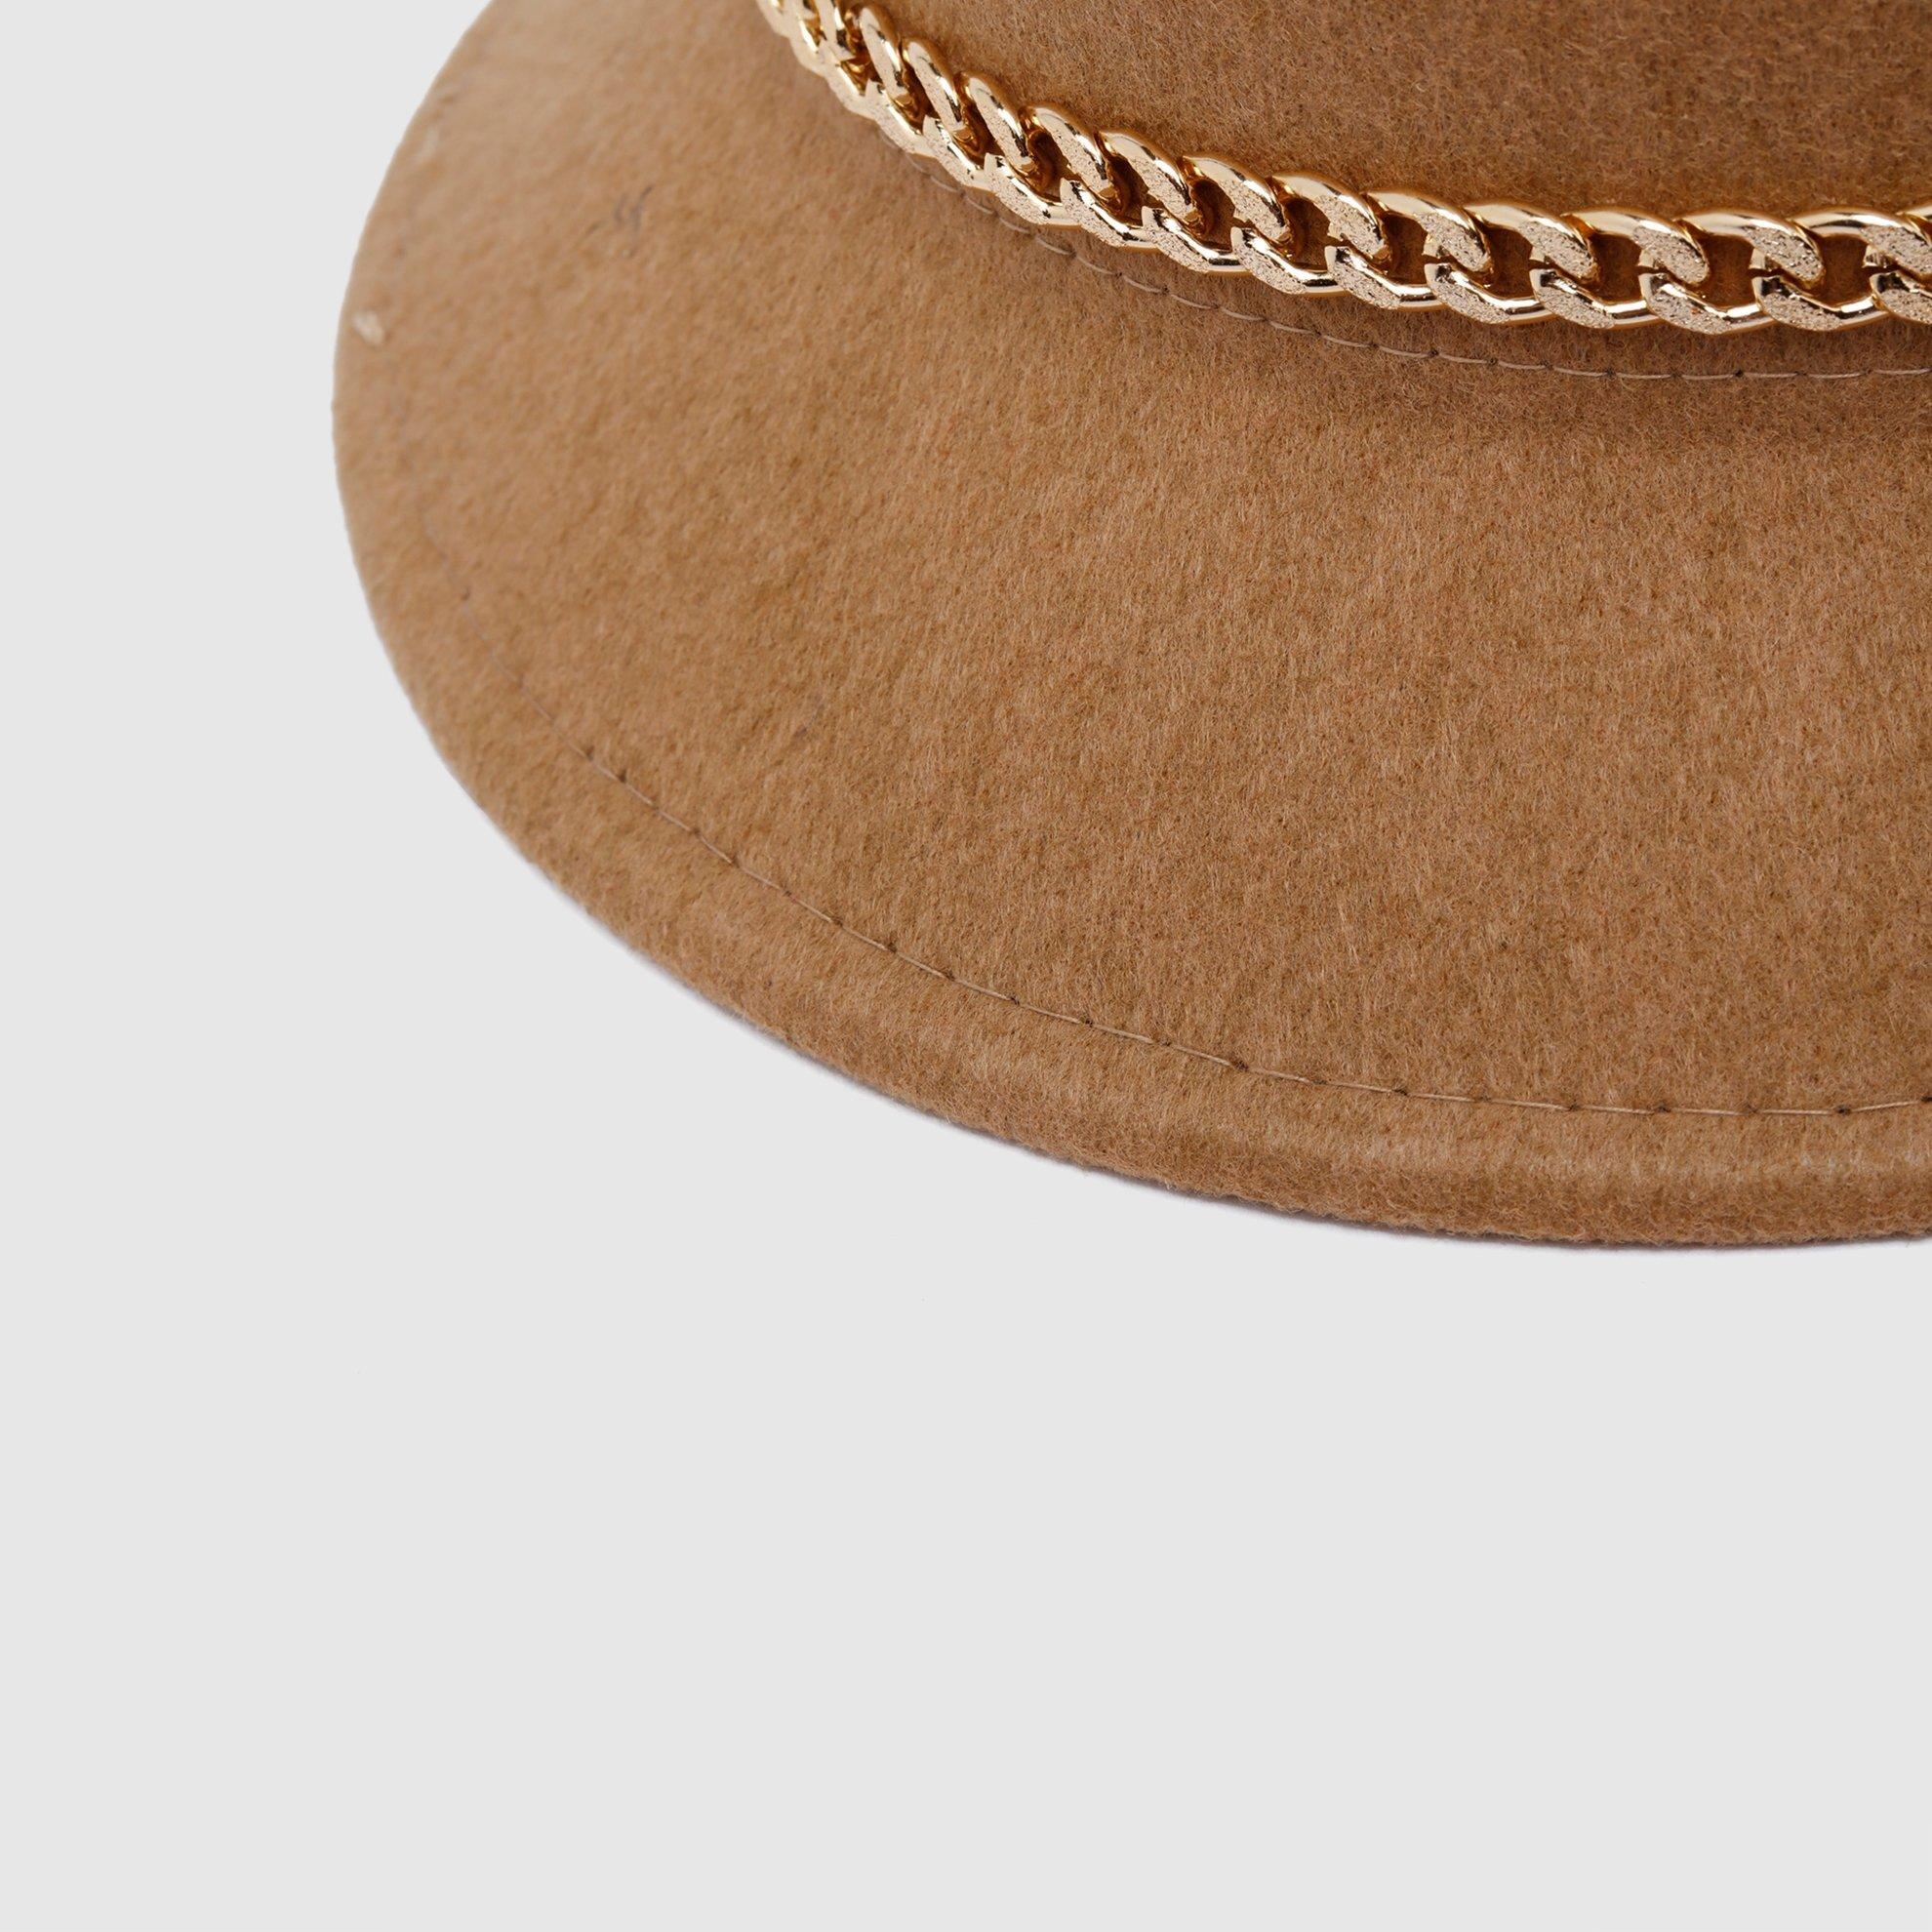 resm Zincir Detaylı Şapka